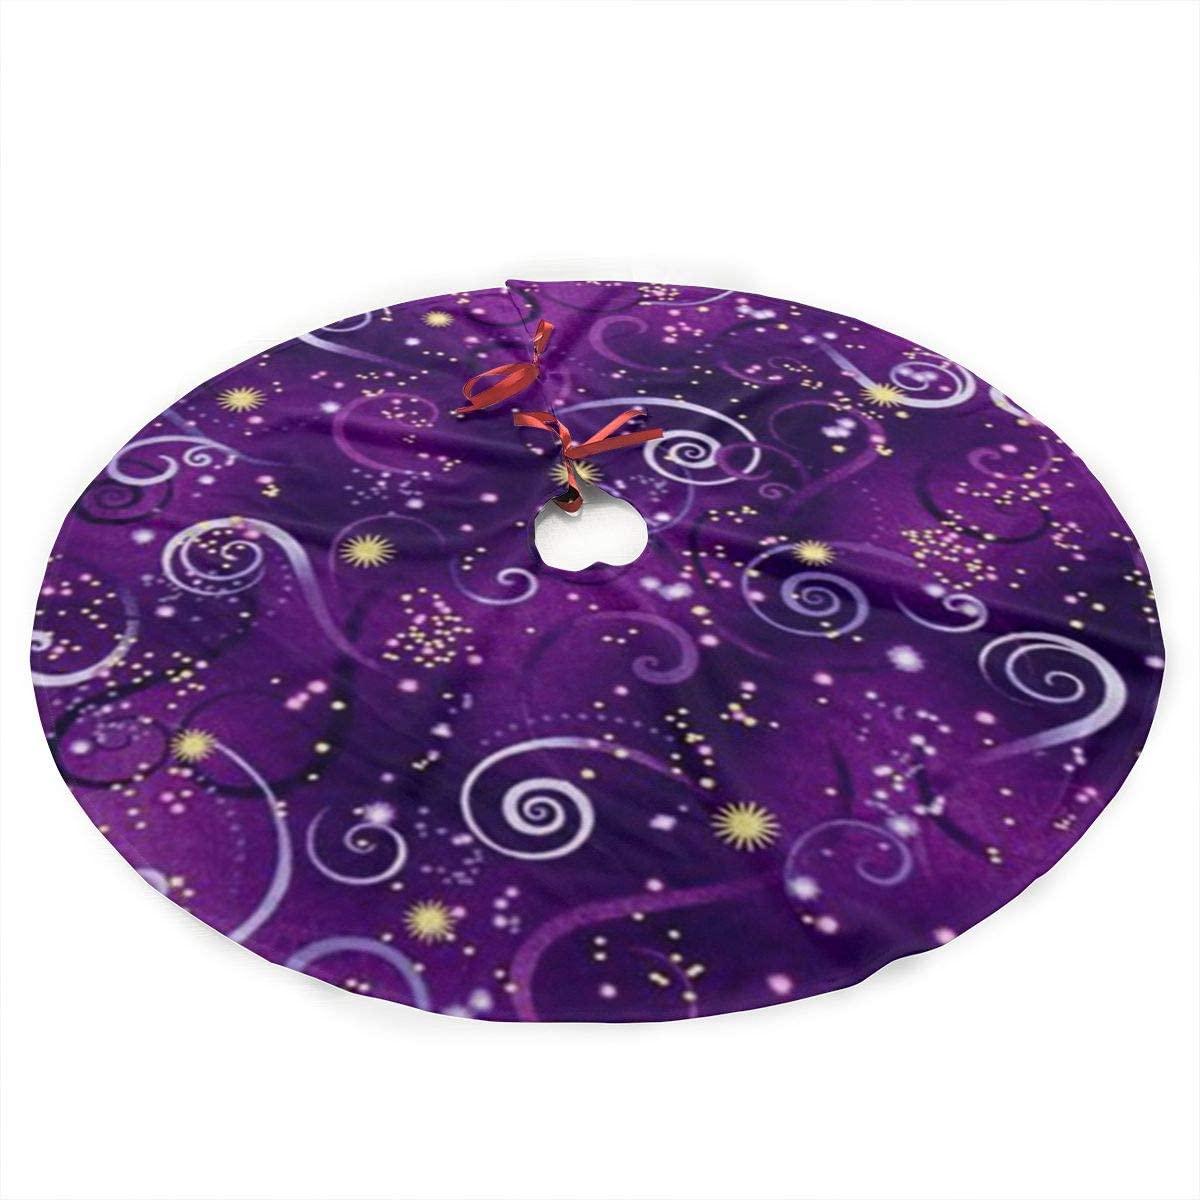 antkondnm Dragonfly Metallic Swirling Sky Deep Purple Christmas Tree Skirt - 36